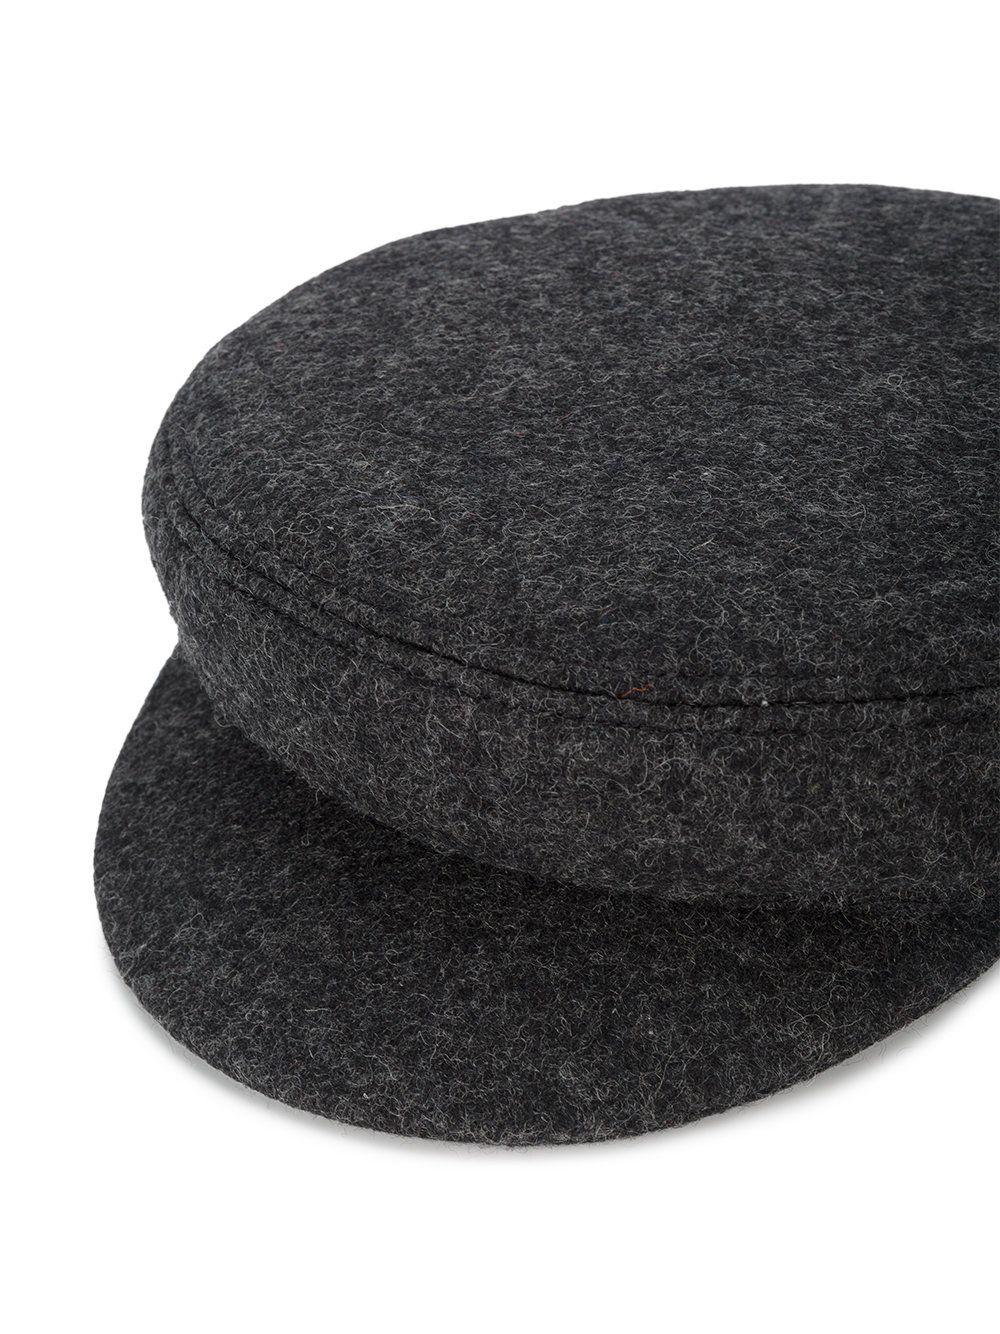 ba9f5679b75 Isabel Marant Evie Wool Baker Boy Hat grey 02ananthracite women Accessories  Hats  w-12175843